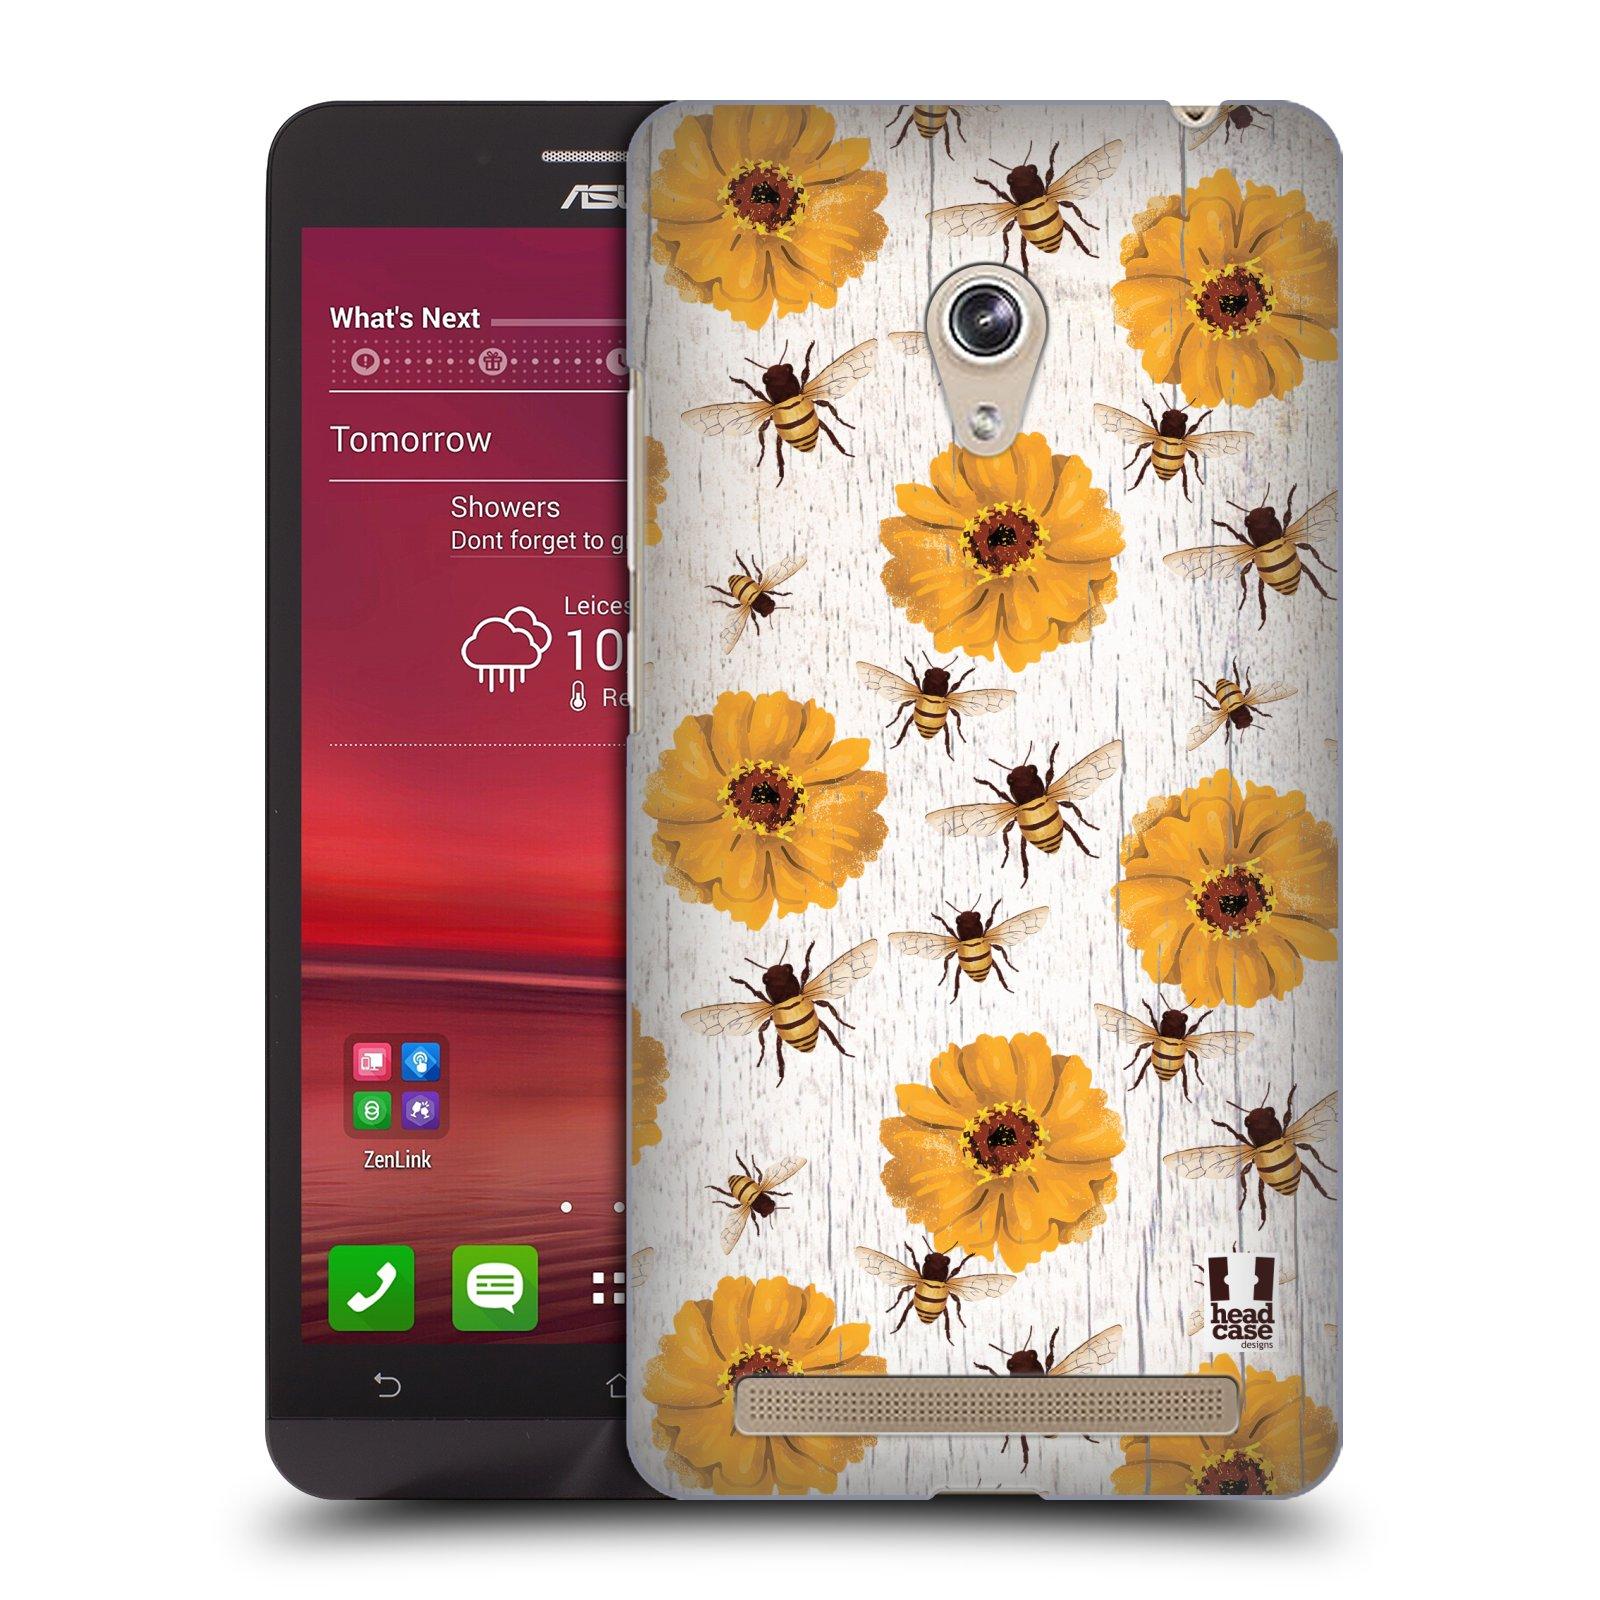 Plastové pouzdro na mobil Asus Zenfone 6 HEAD CASE LIFE IN THE COUNTRY ZINNIAS (Kryt či obal na mobilní telefon Asus Zenfone 6 A600CG / A601CG)